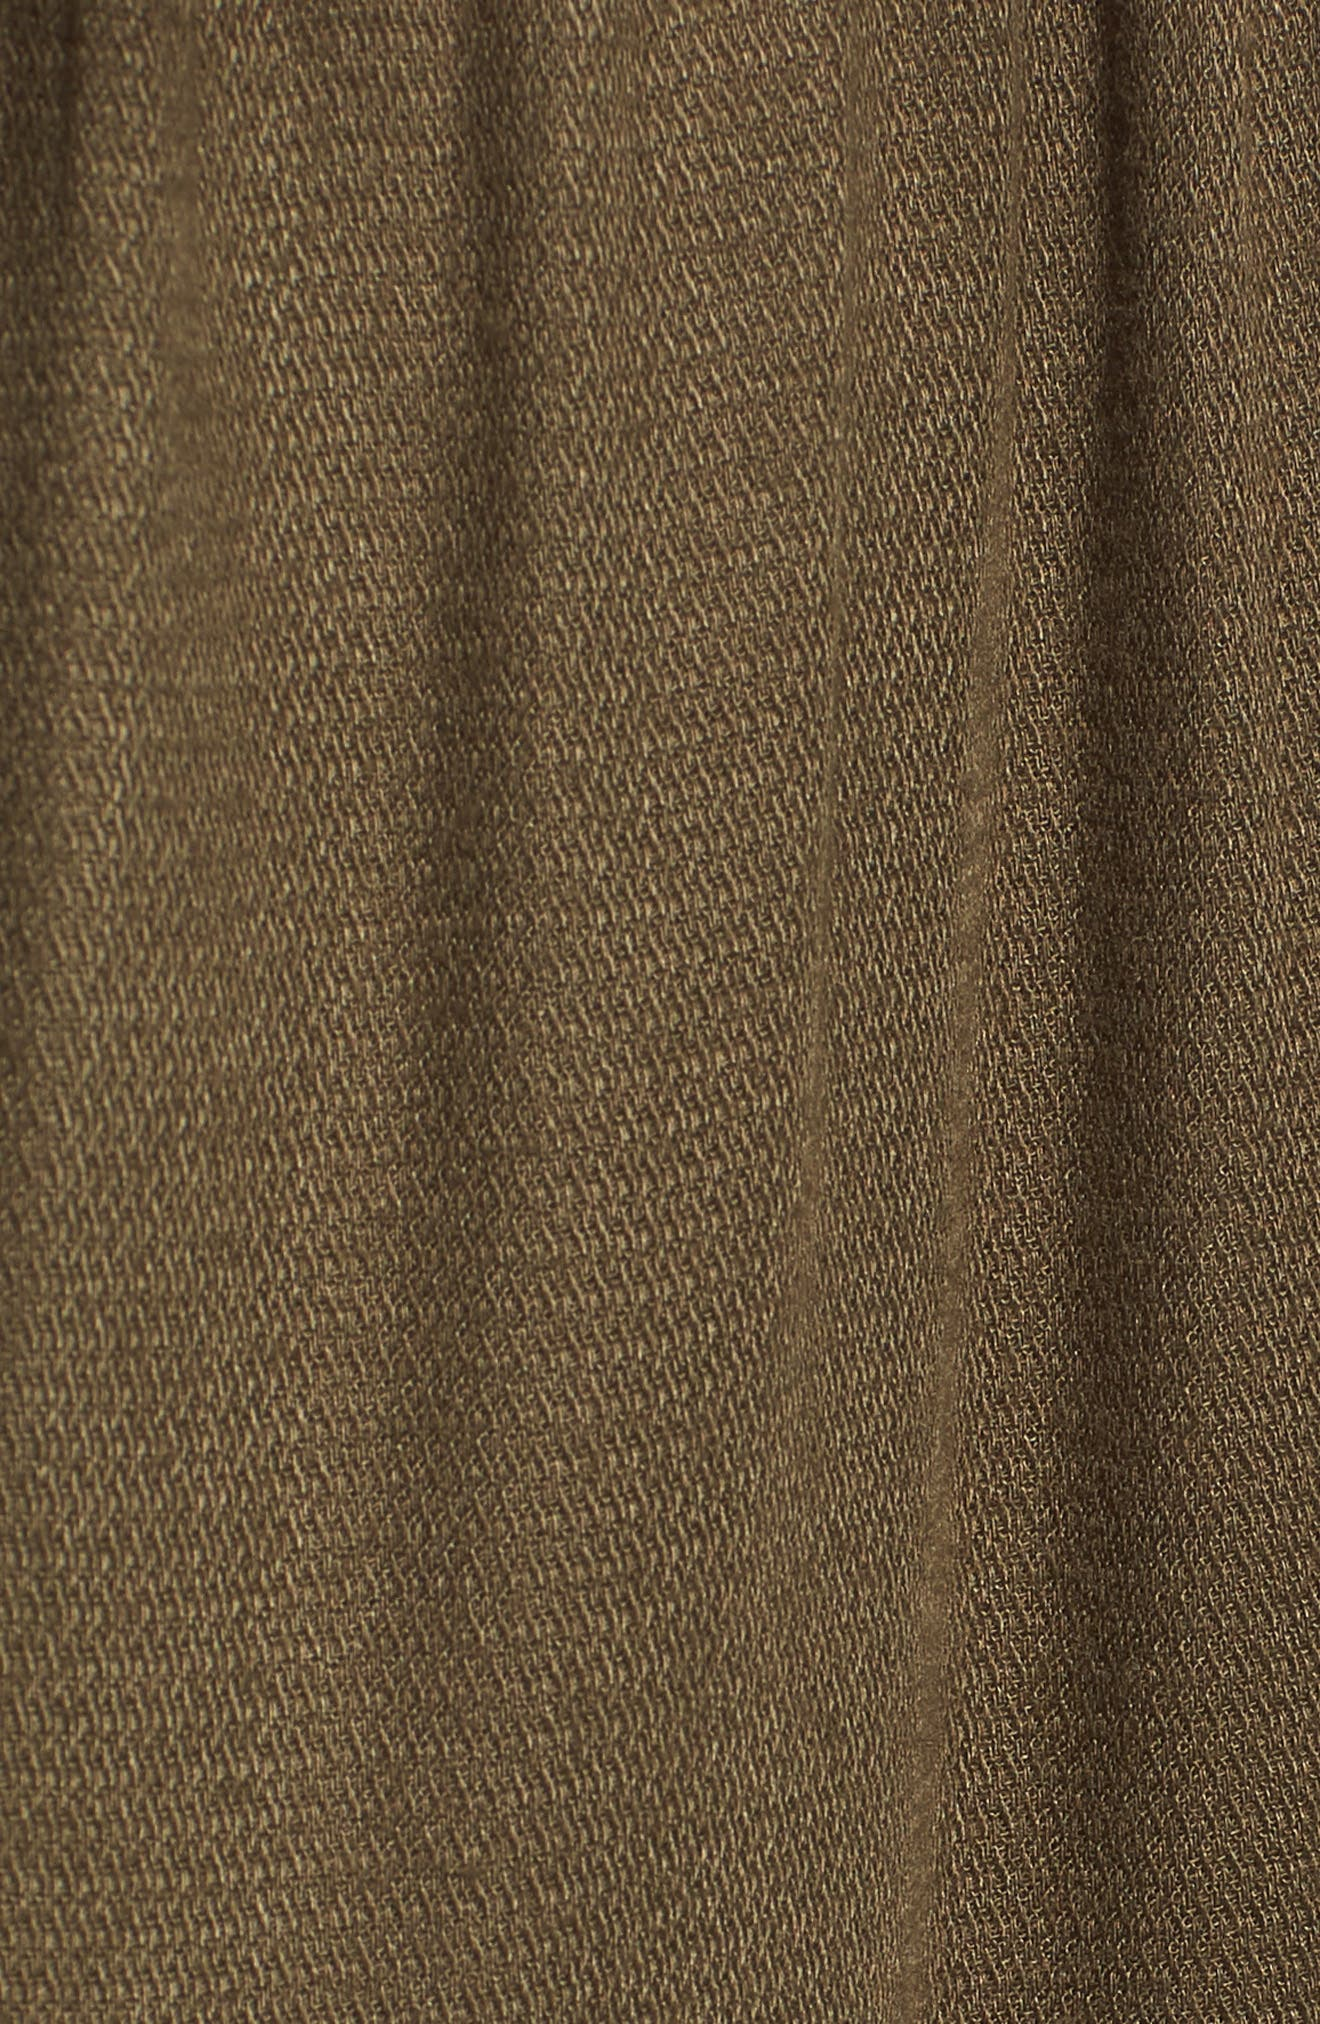 Vary Yume Shorts,                             Alternate thumbnail 6, color,                             340